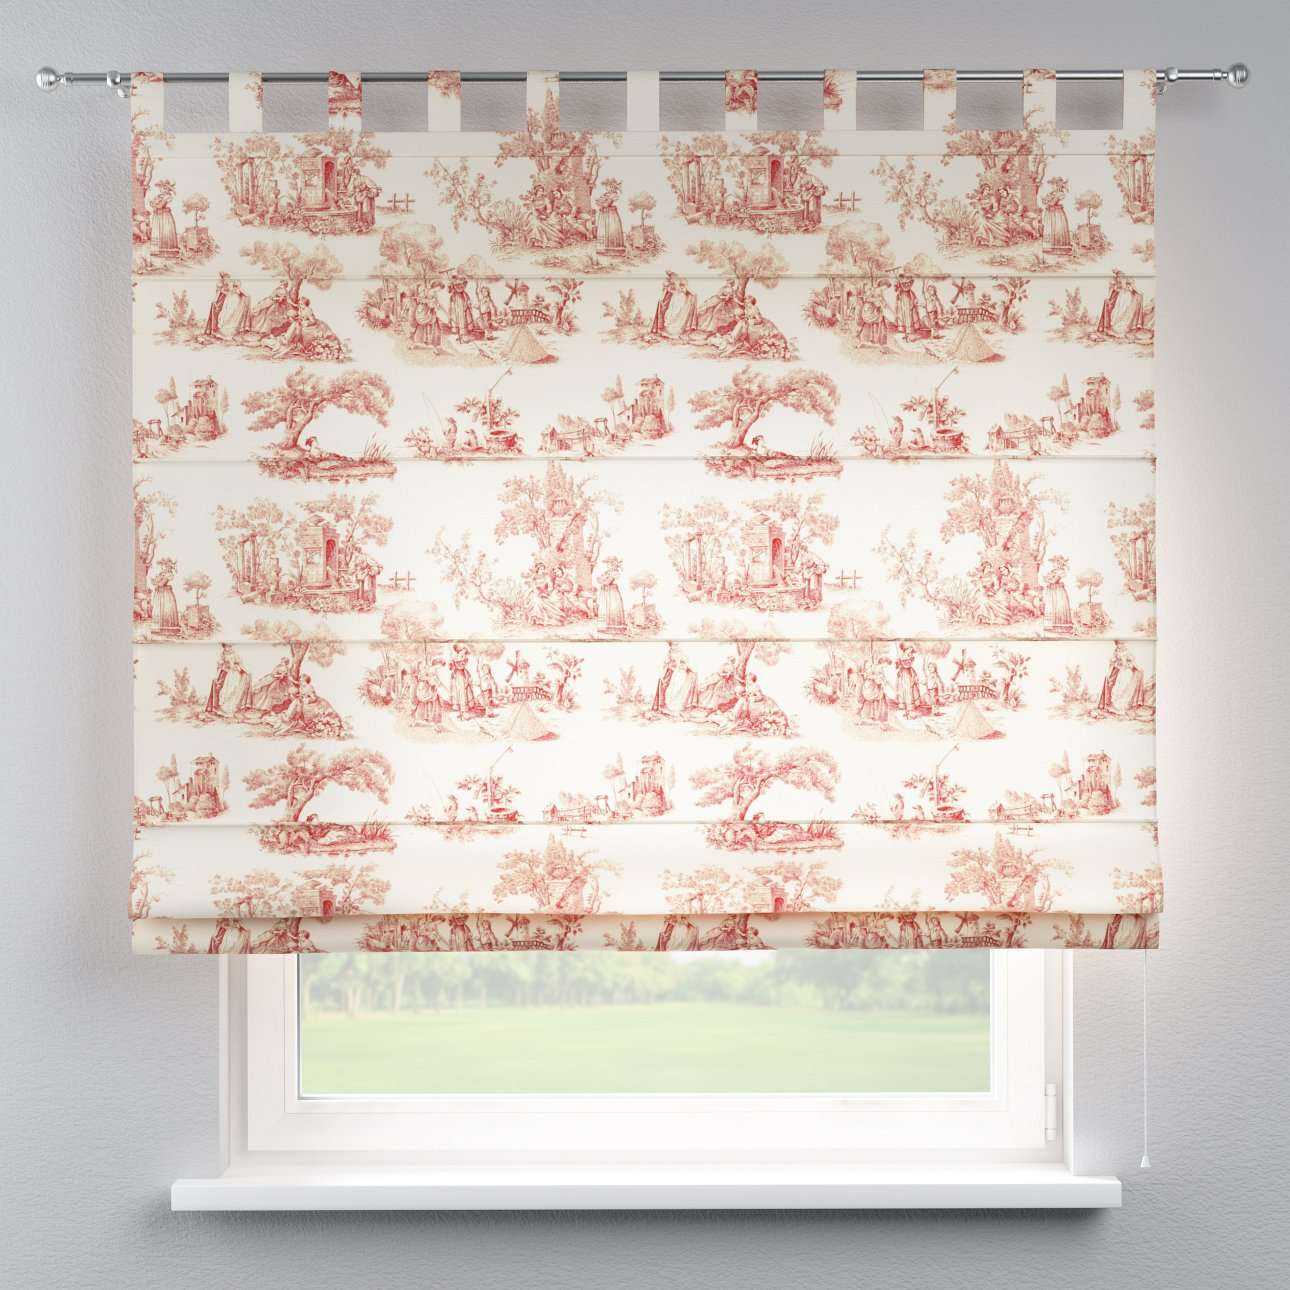 Foldegardin Verona<br/>Med stropper til gardinstang 80 x 170 cm fra kollektionen Avinon, Stof: 132-15